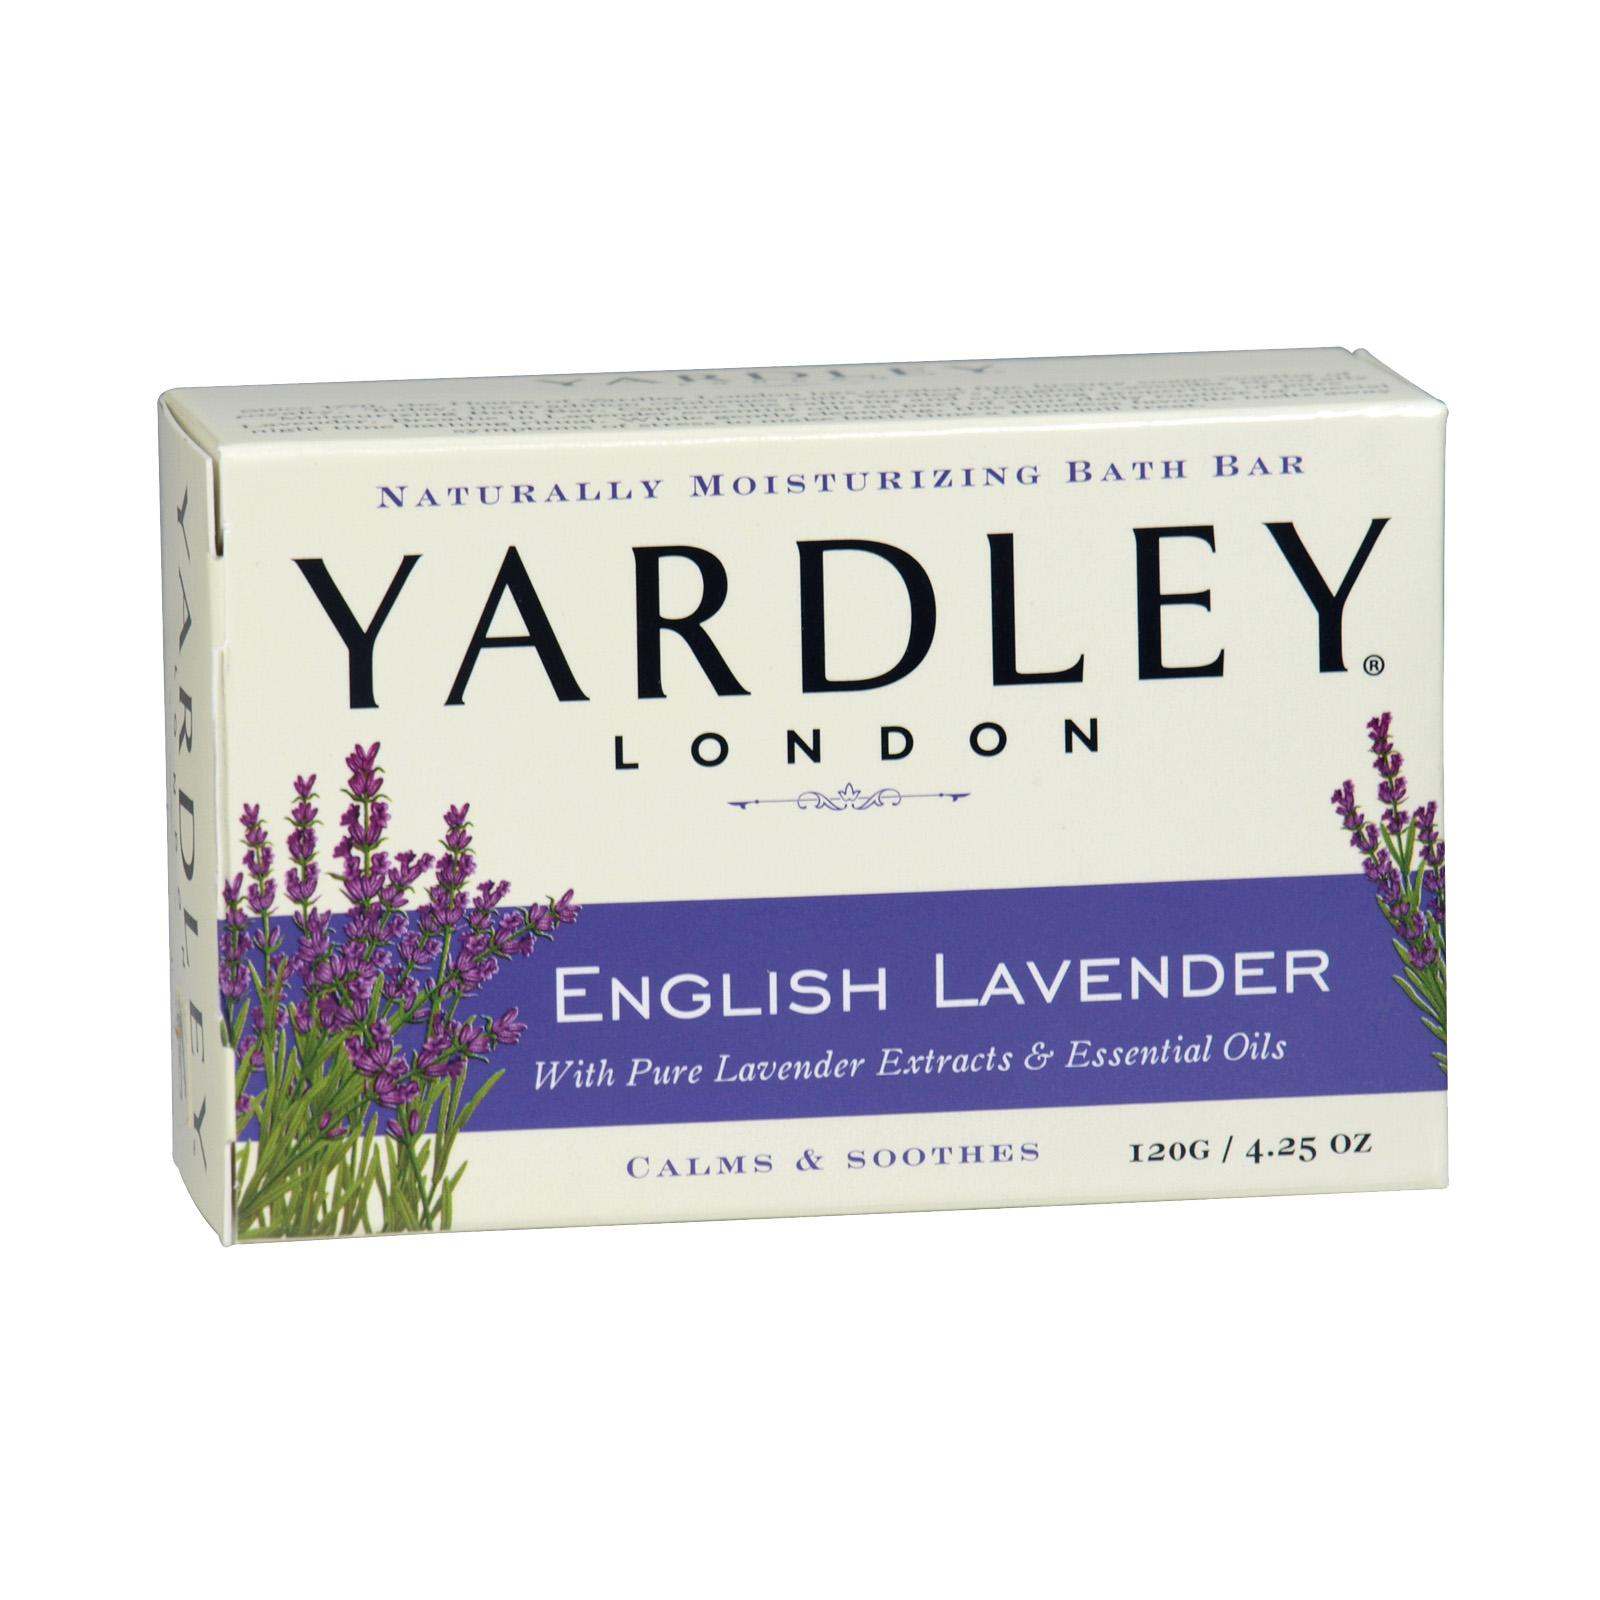 YARDLEY SOAP BOXED 120GM E/LAVENDER